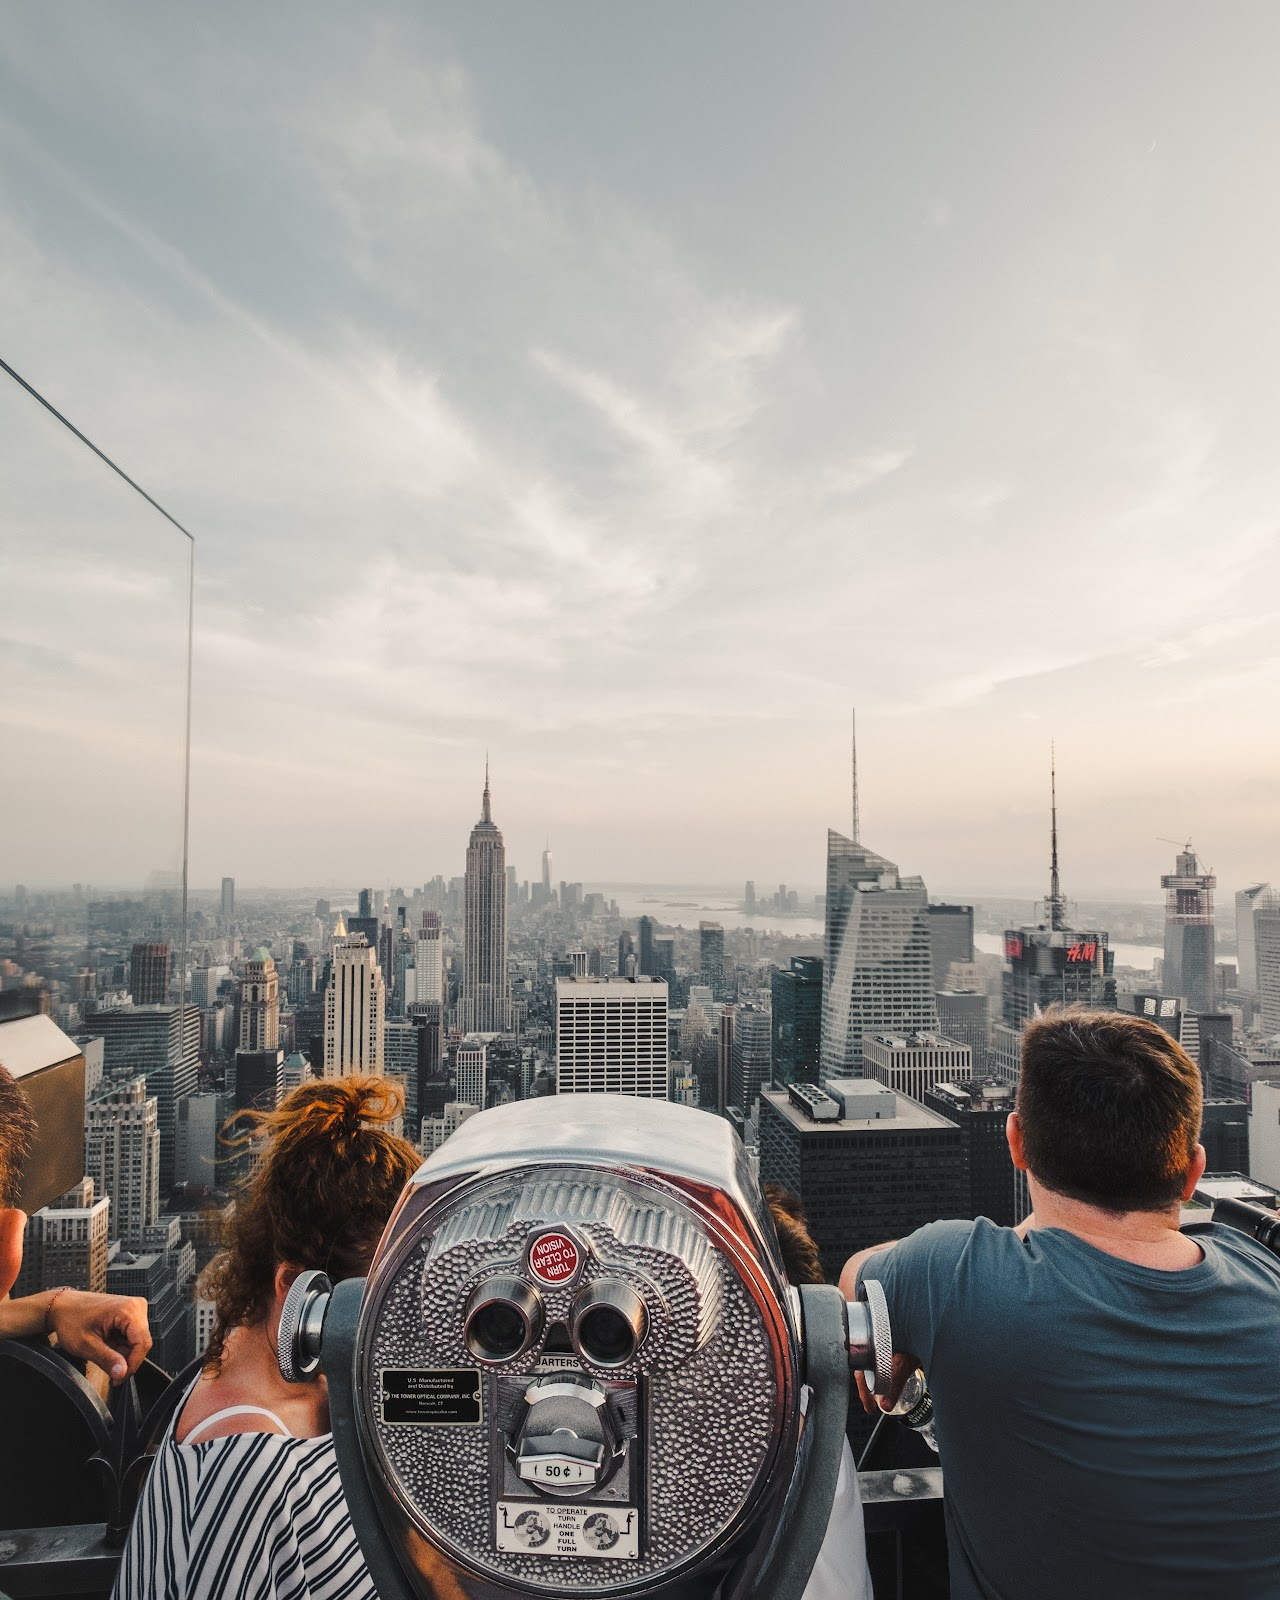 Budget friendly fun in New York